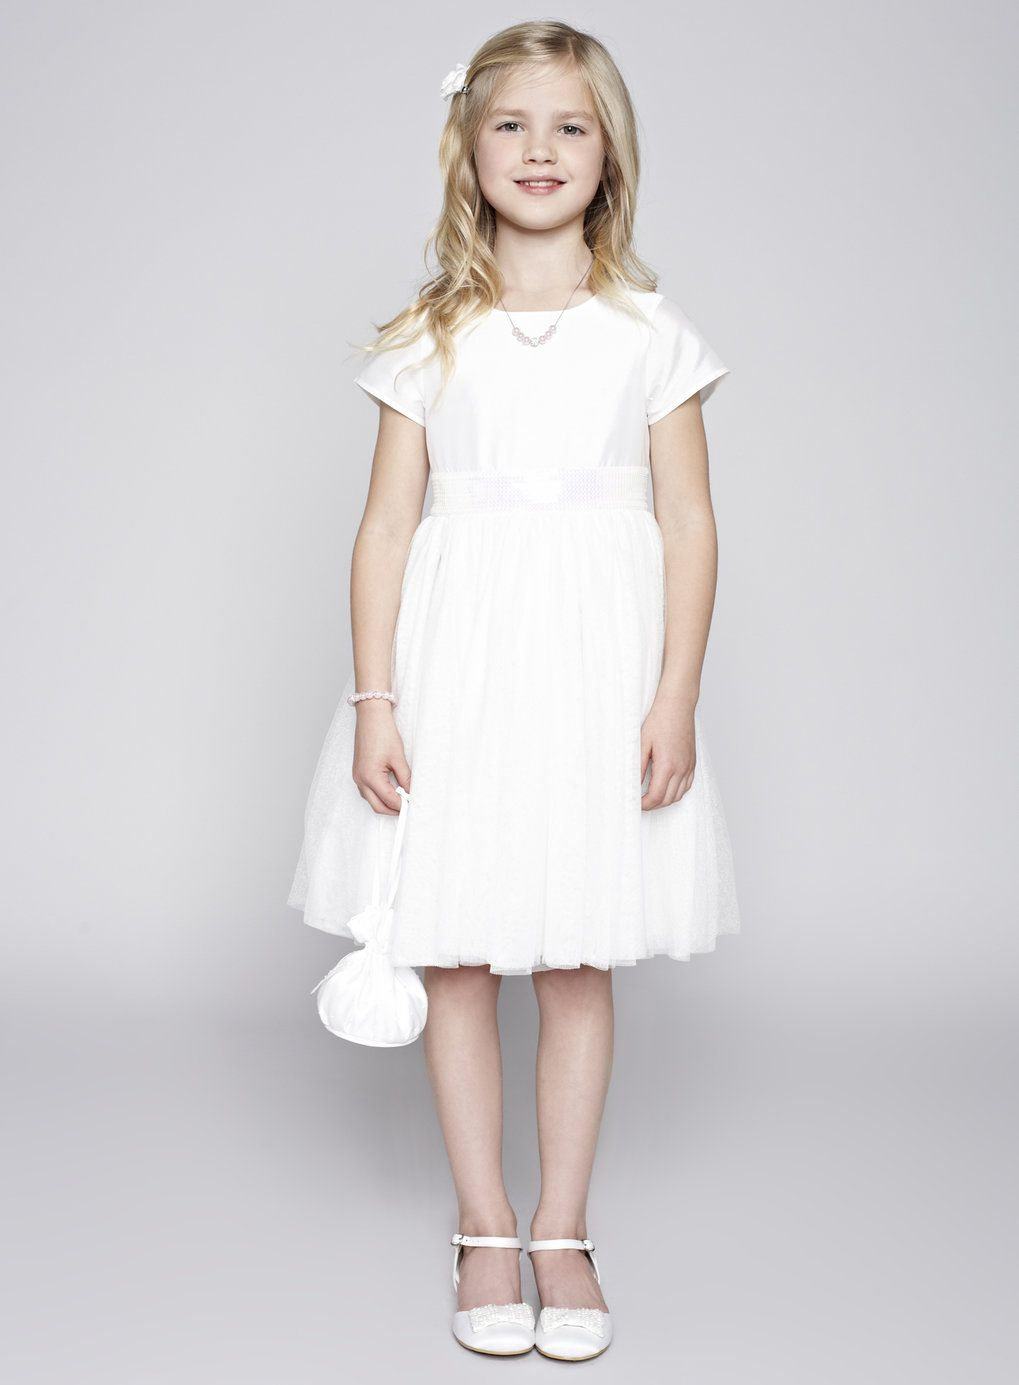 Alexa ivory flower girl dress bhs wedding flower girl alexa ivory flower girl dress bhs ombrellifo Gallery